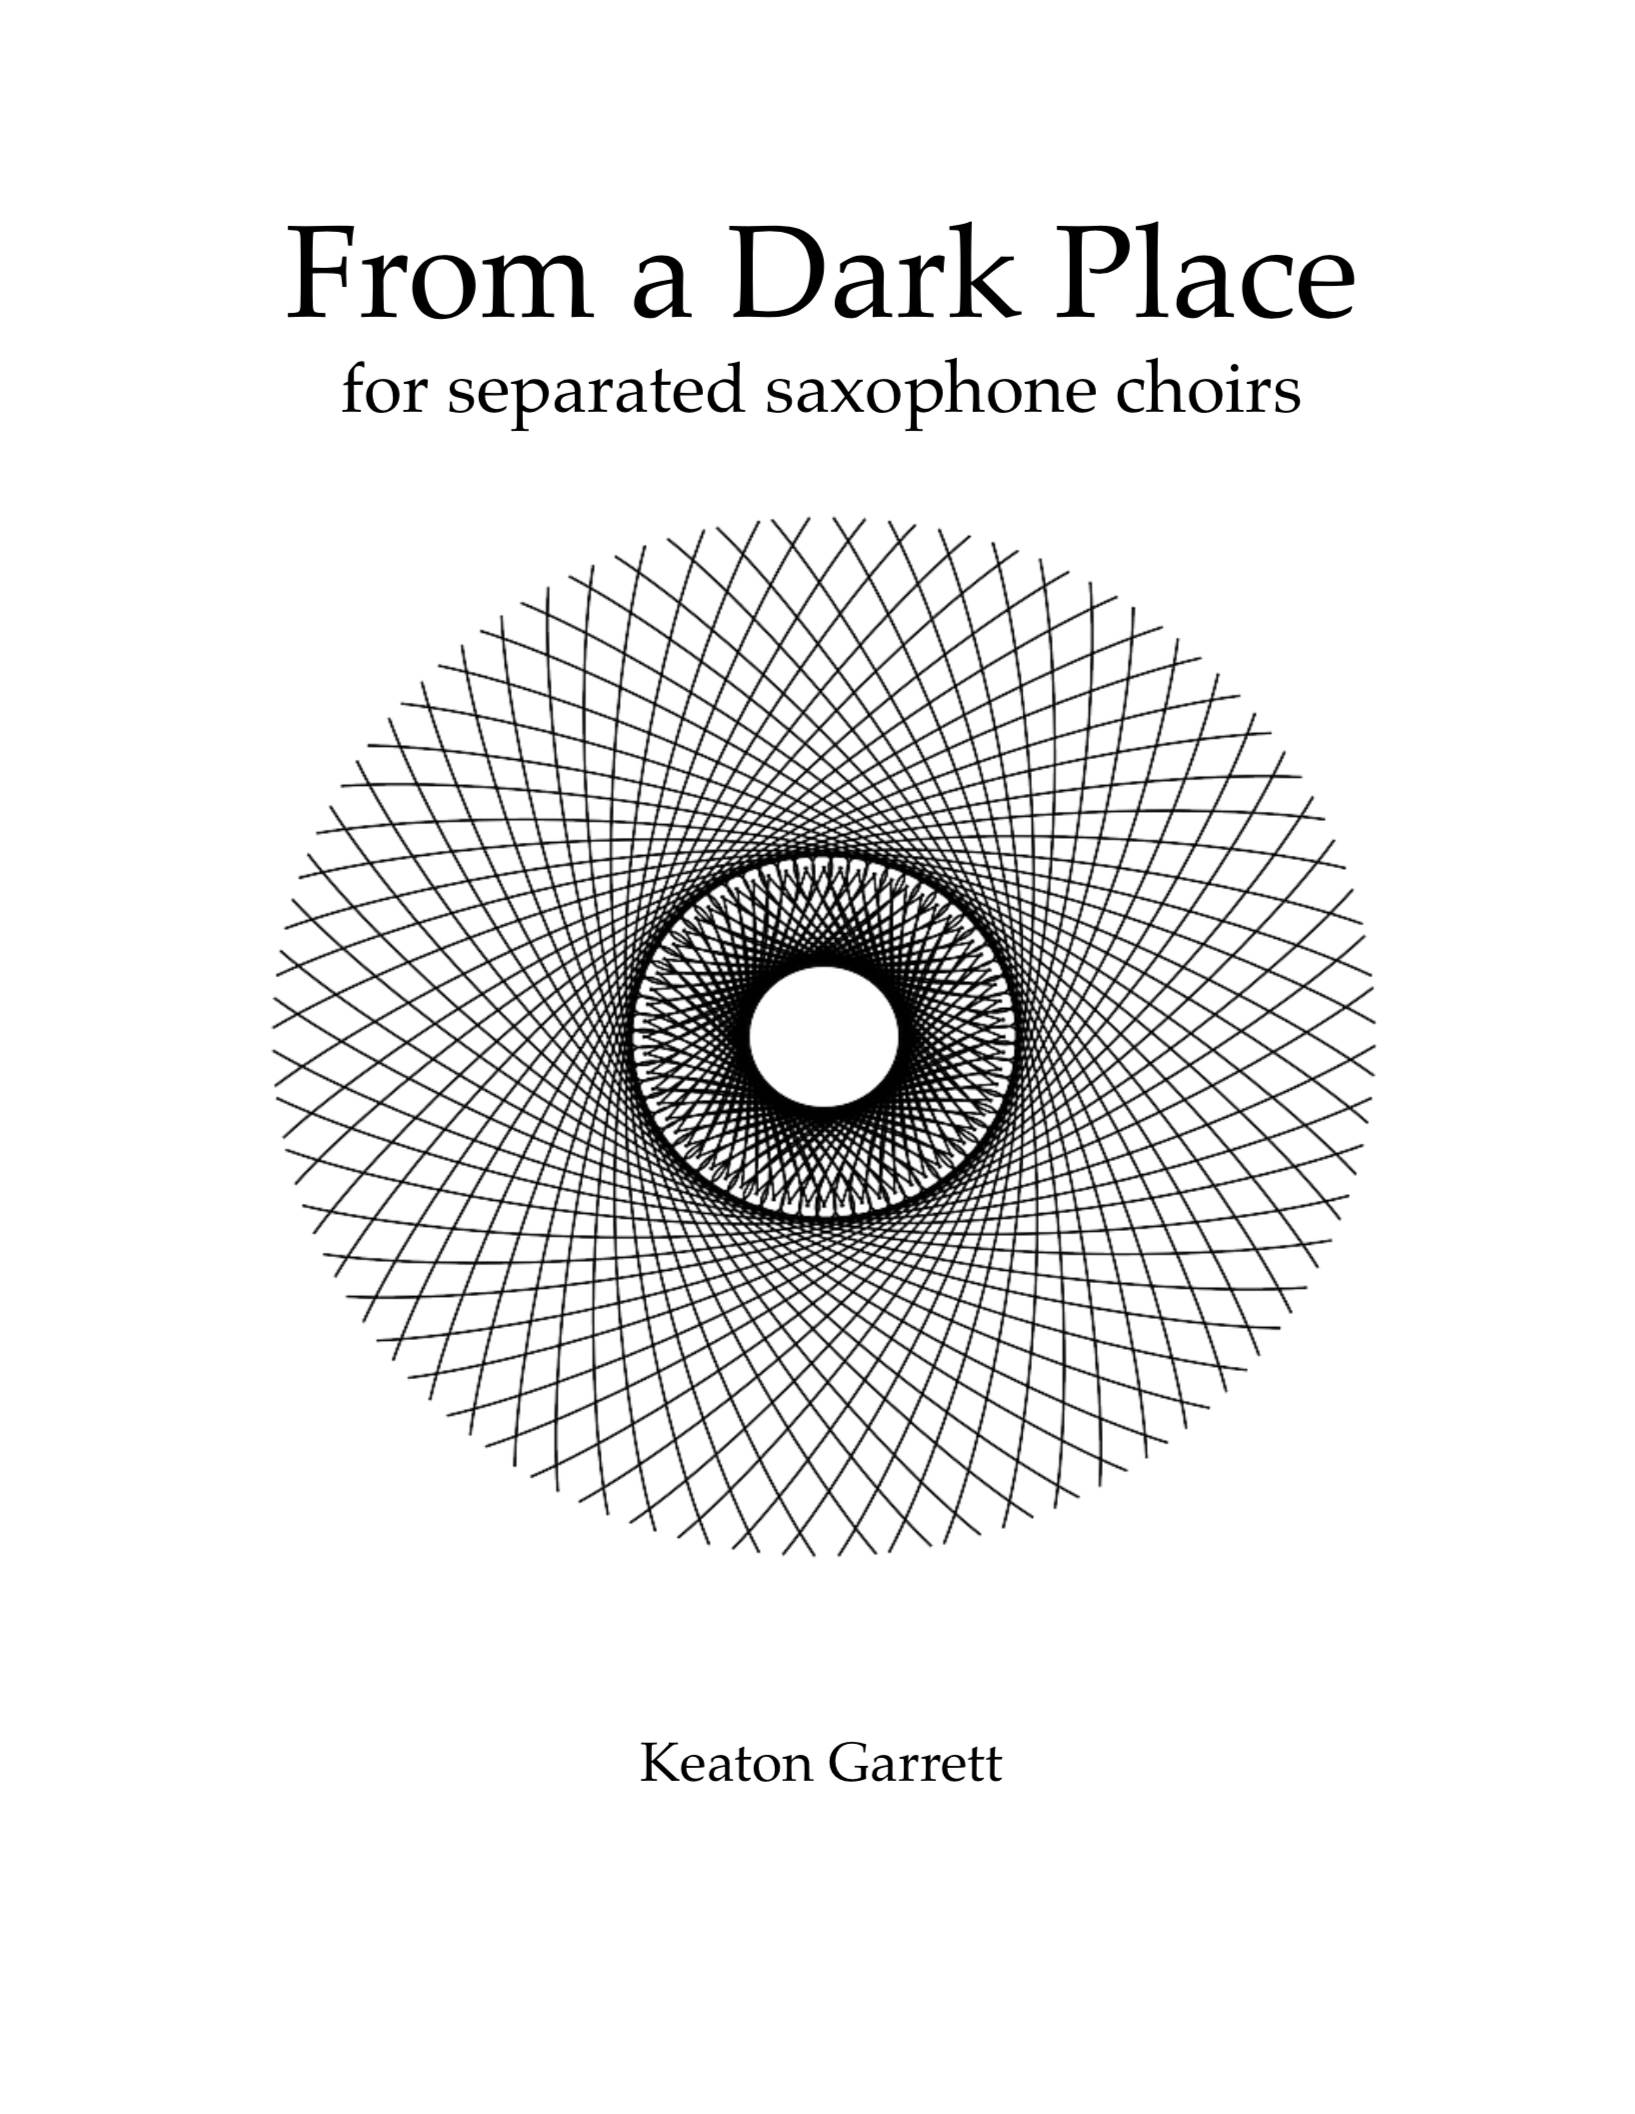 From A Dark Place by Keaton Garrett